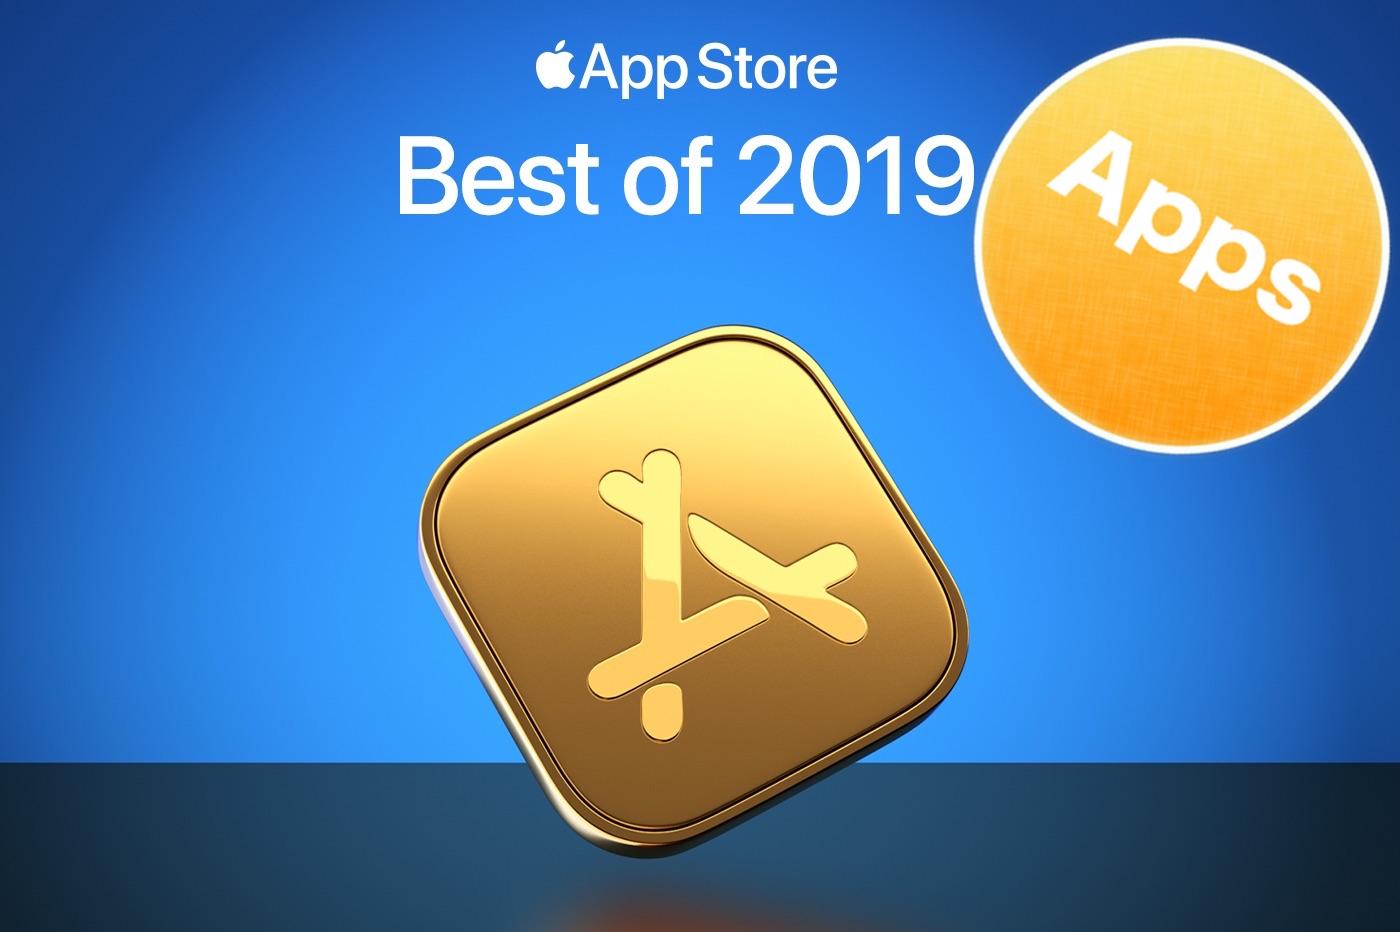 Apple best-of App Store 2019 applications